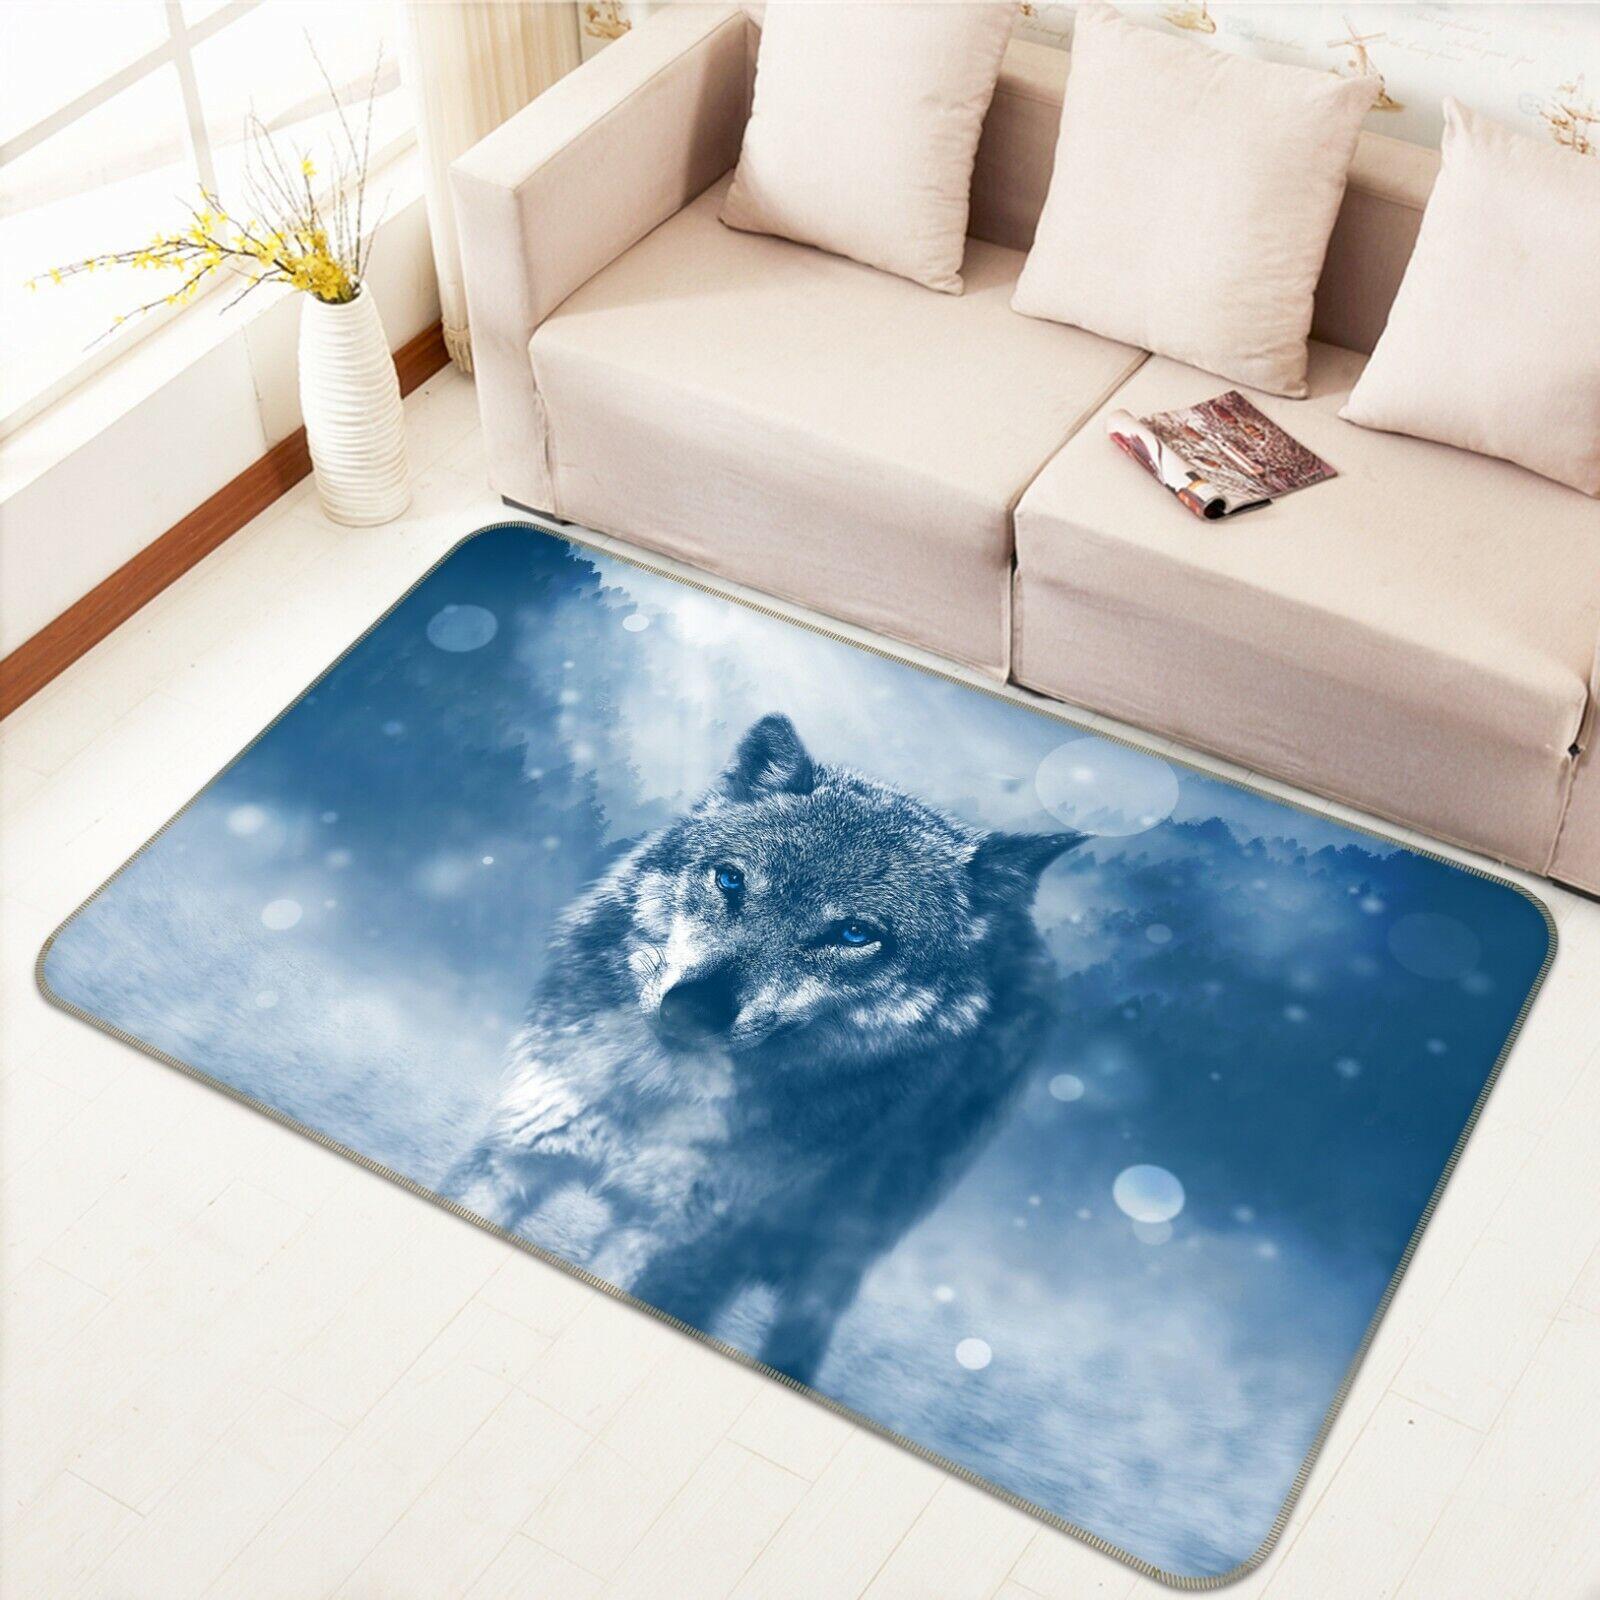 3D Woods Night Wolf C325 Animal Non Slip Rug Mat Elegant Photo Carpet Zoe